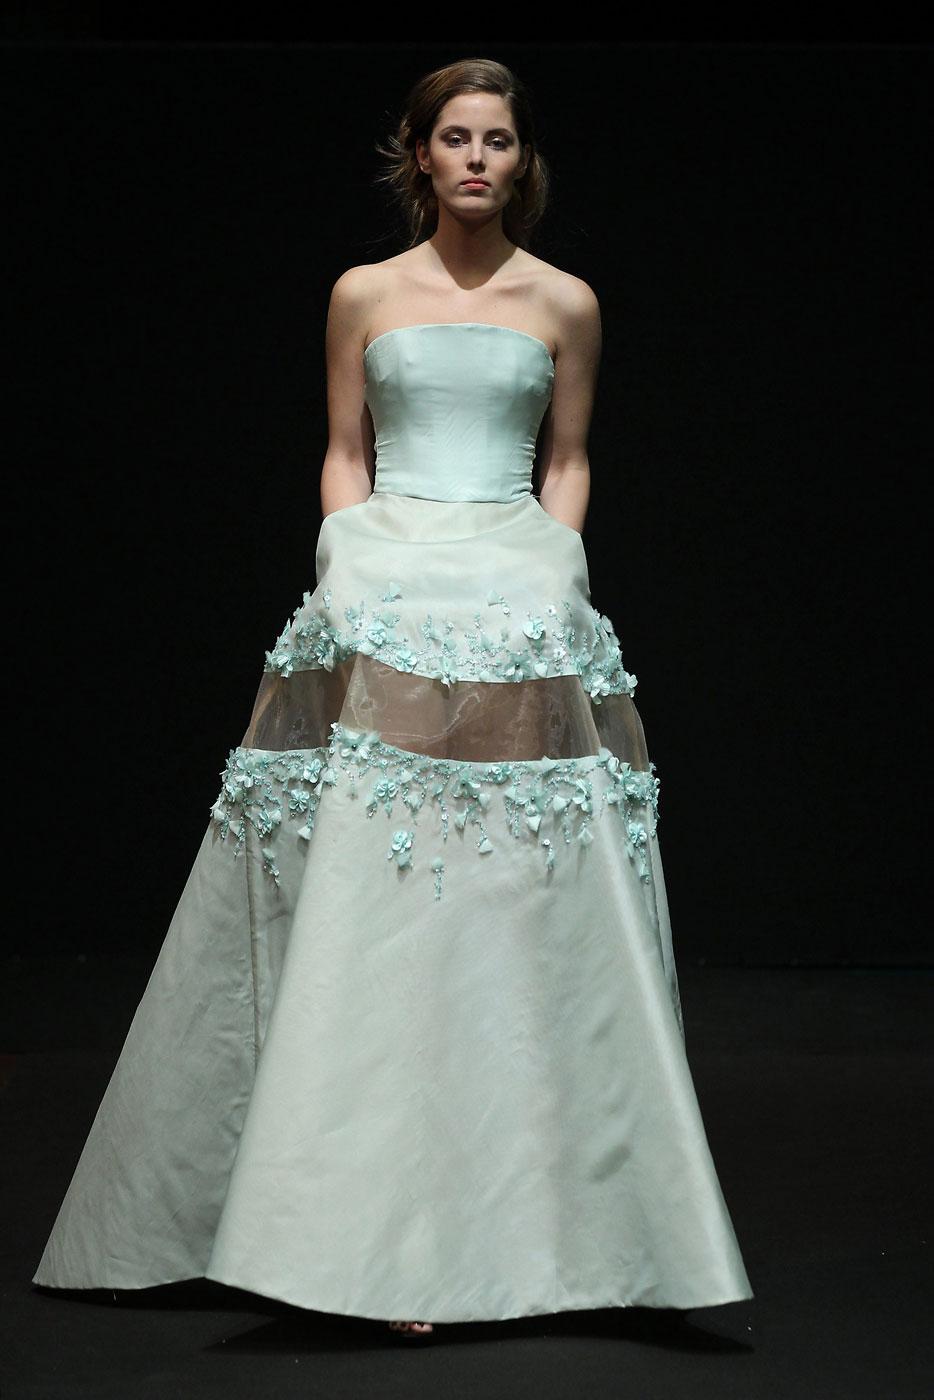 Abed-Mahfouz-fashion-runway-show-haute-couture-paris-spring-2015-the-impression-09